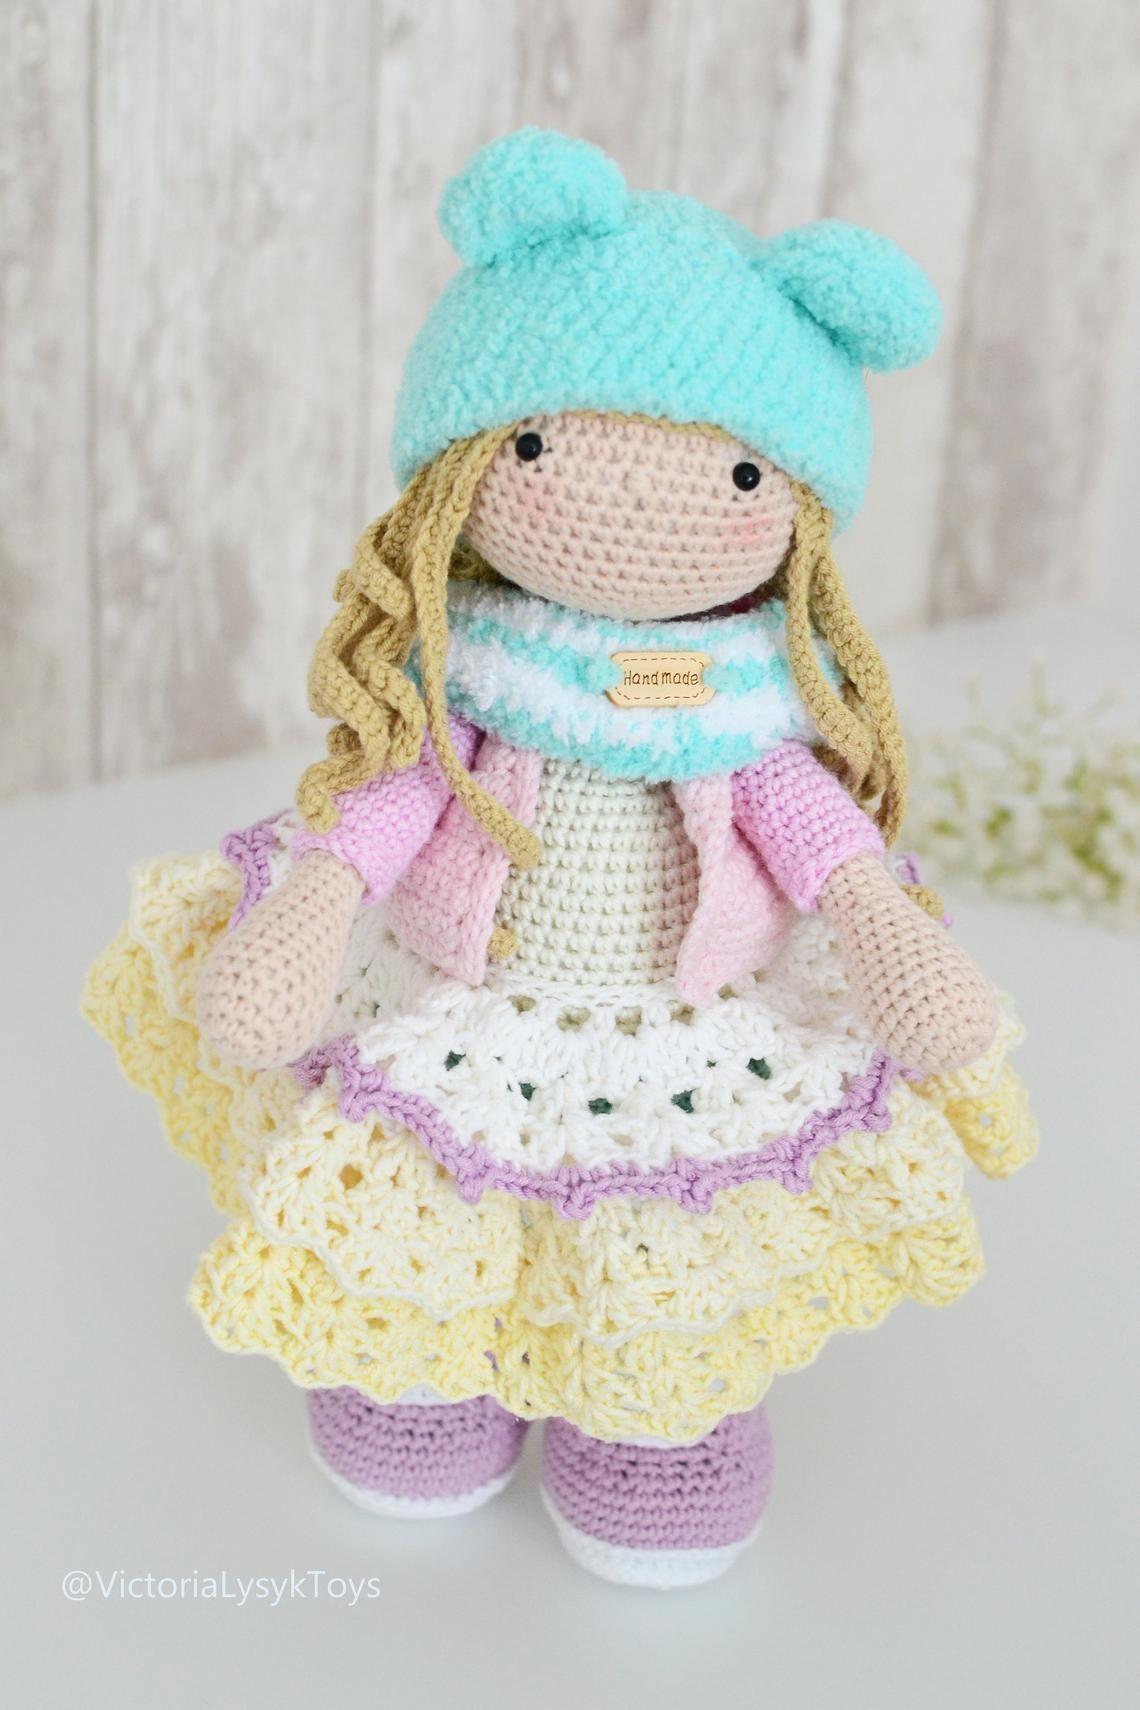 Tilda Bunny Doll crochet ALINA 13 pulgadas hecha a mano   Etsy ...   1710x1140